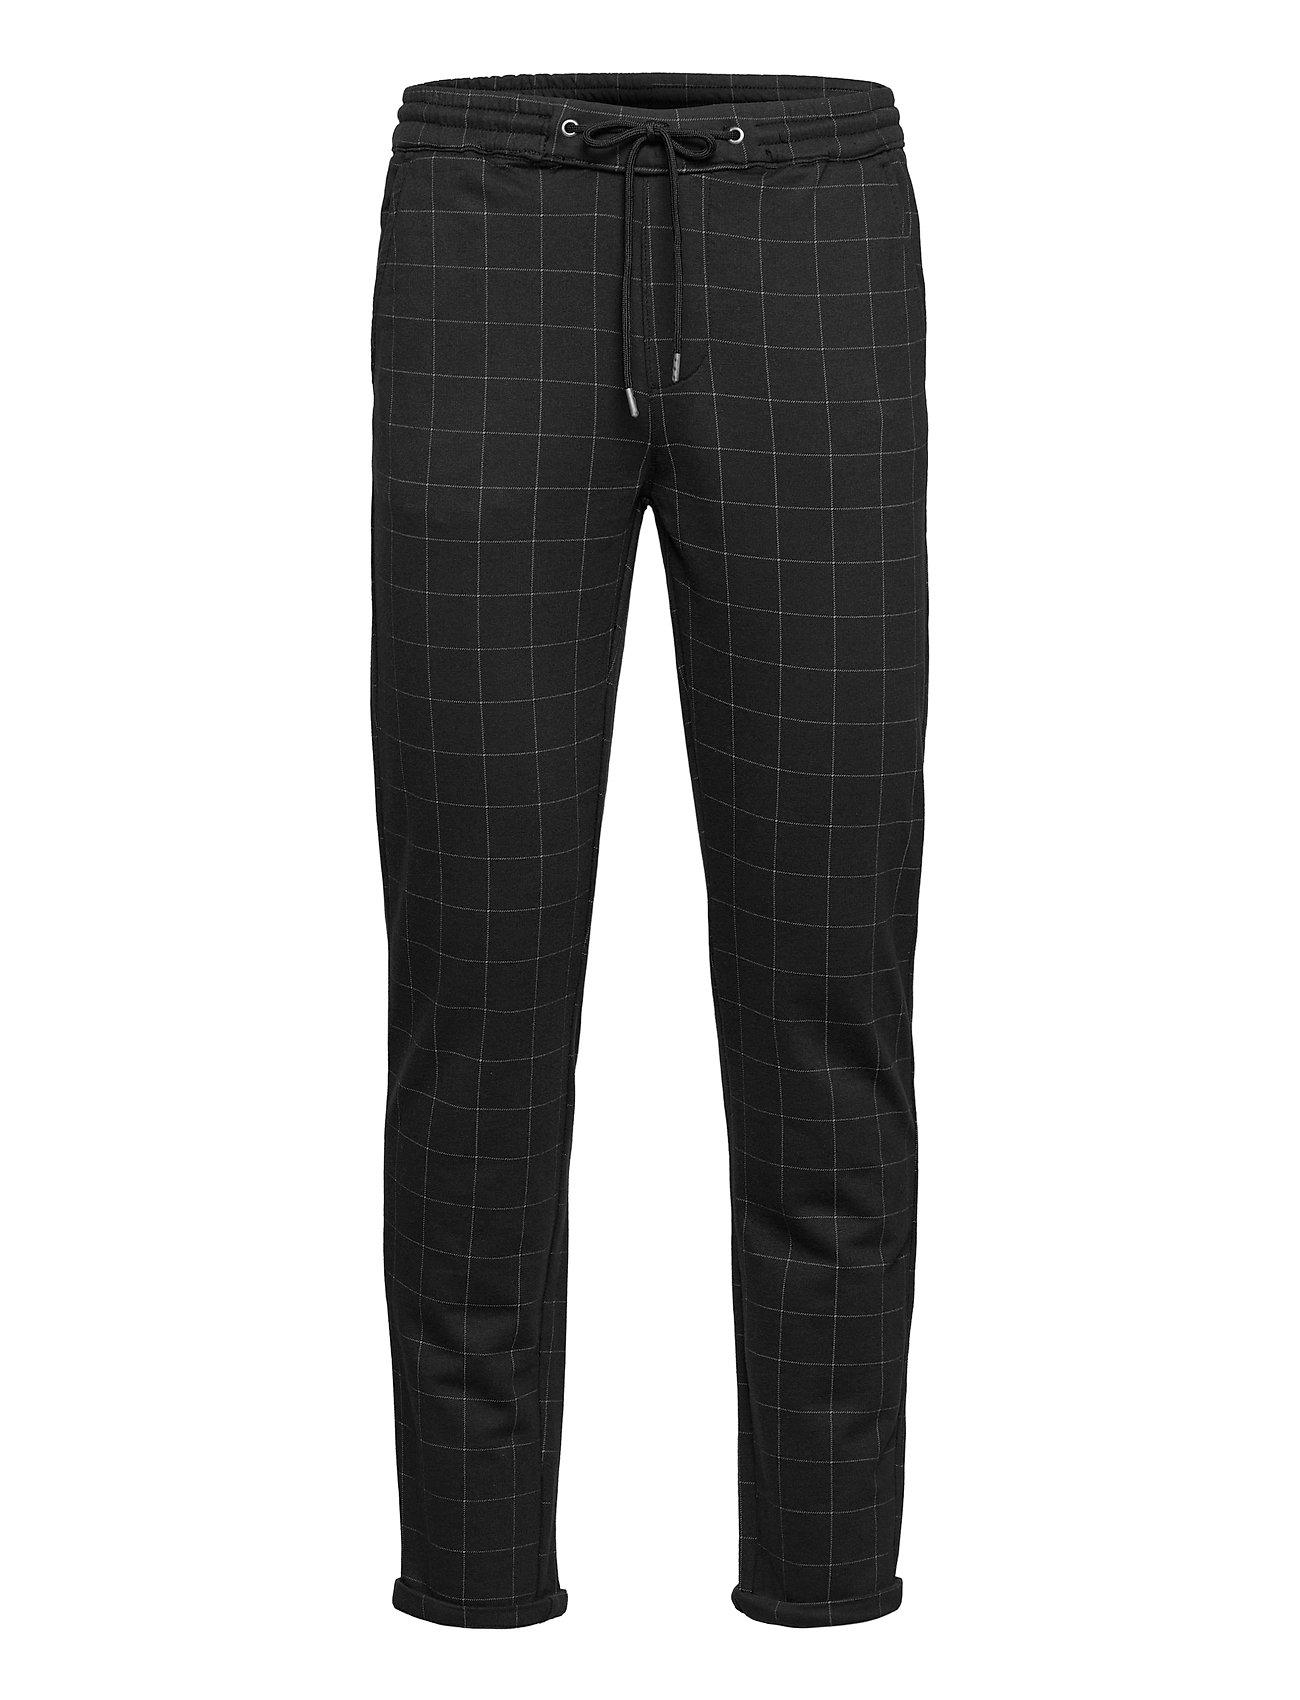 Club Pants With Elastic Waist Casual Bukser Sort Lindbergh